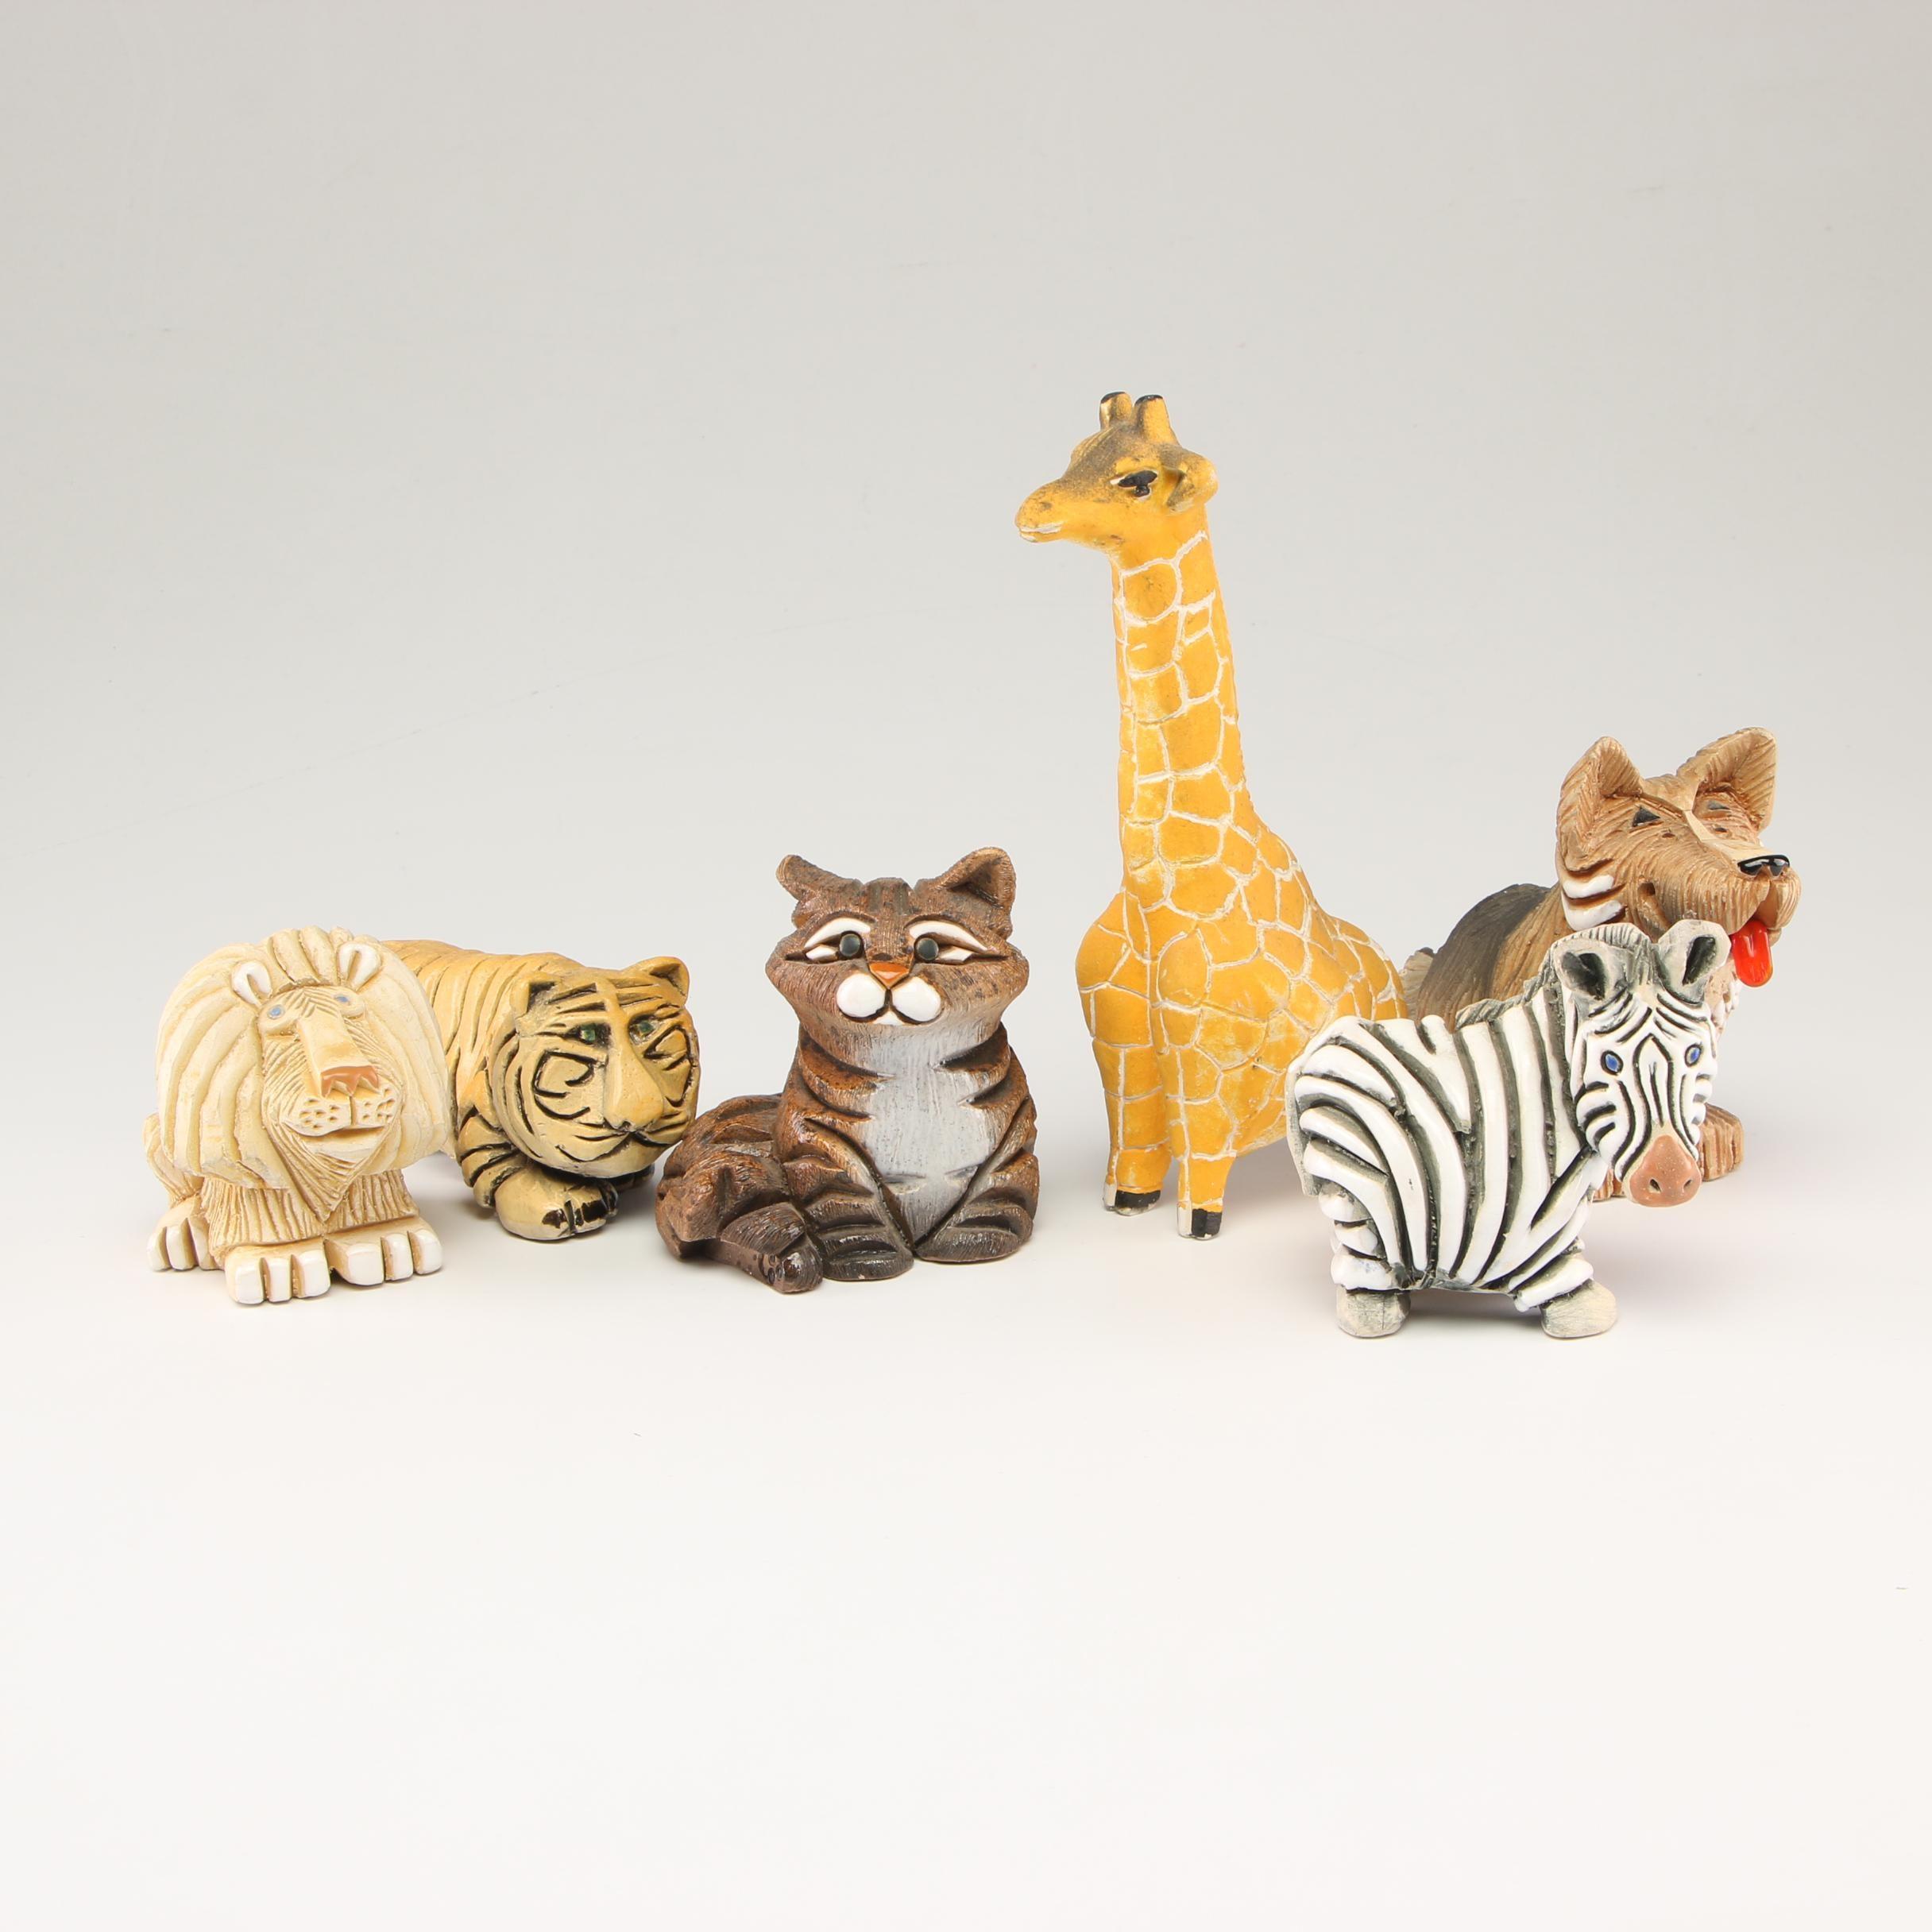 Embellished Resin Animal Figurines